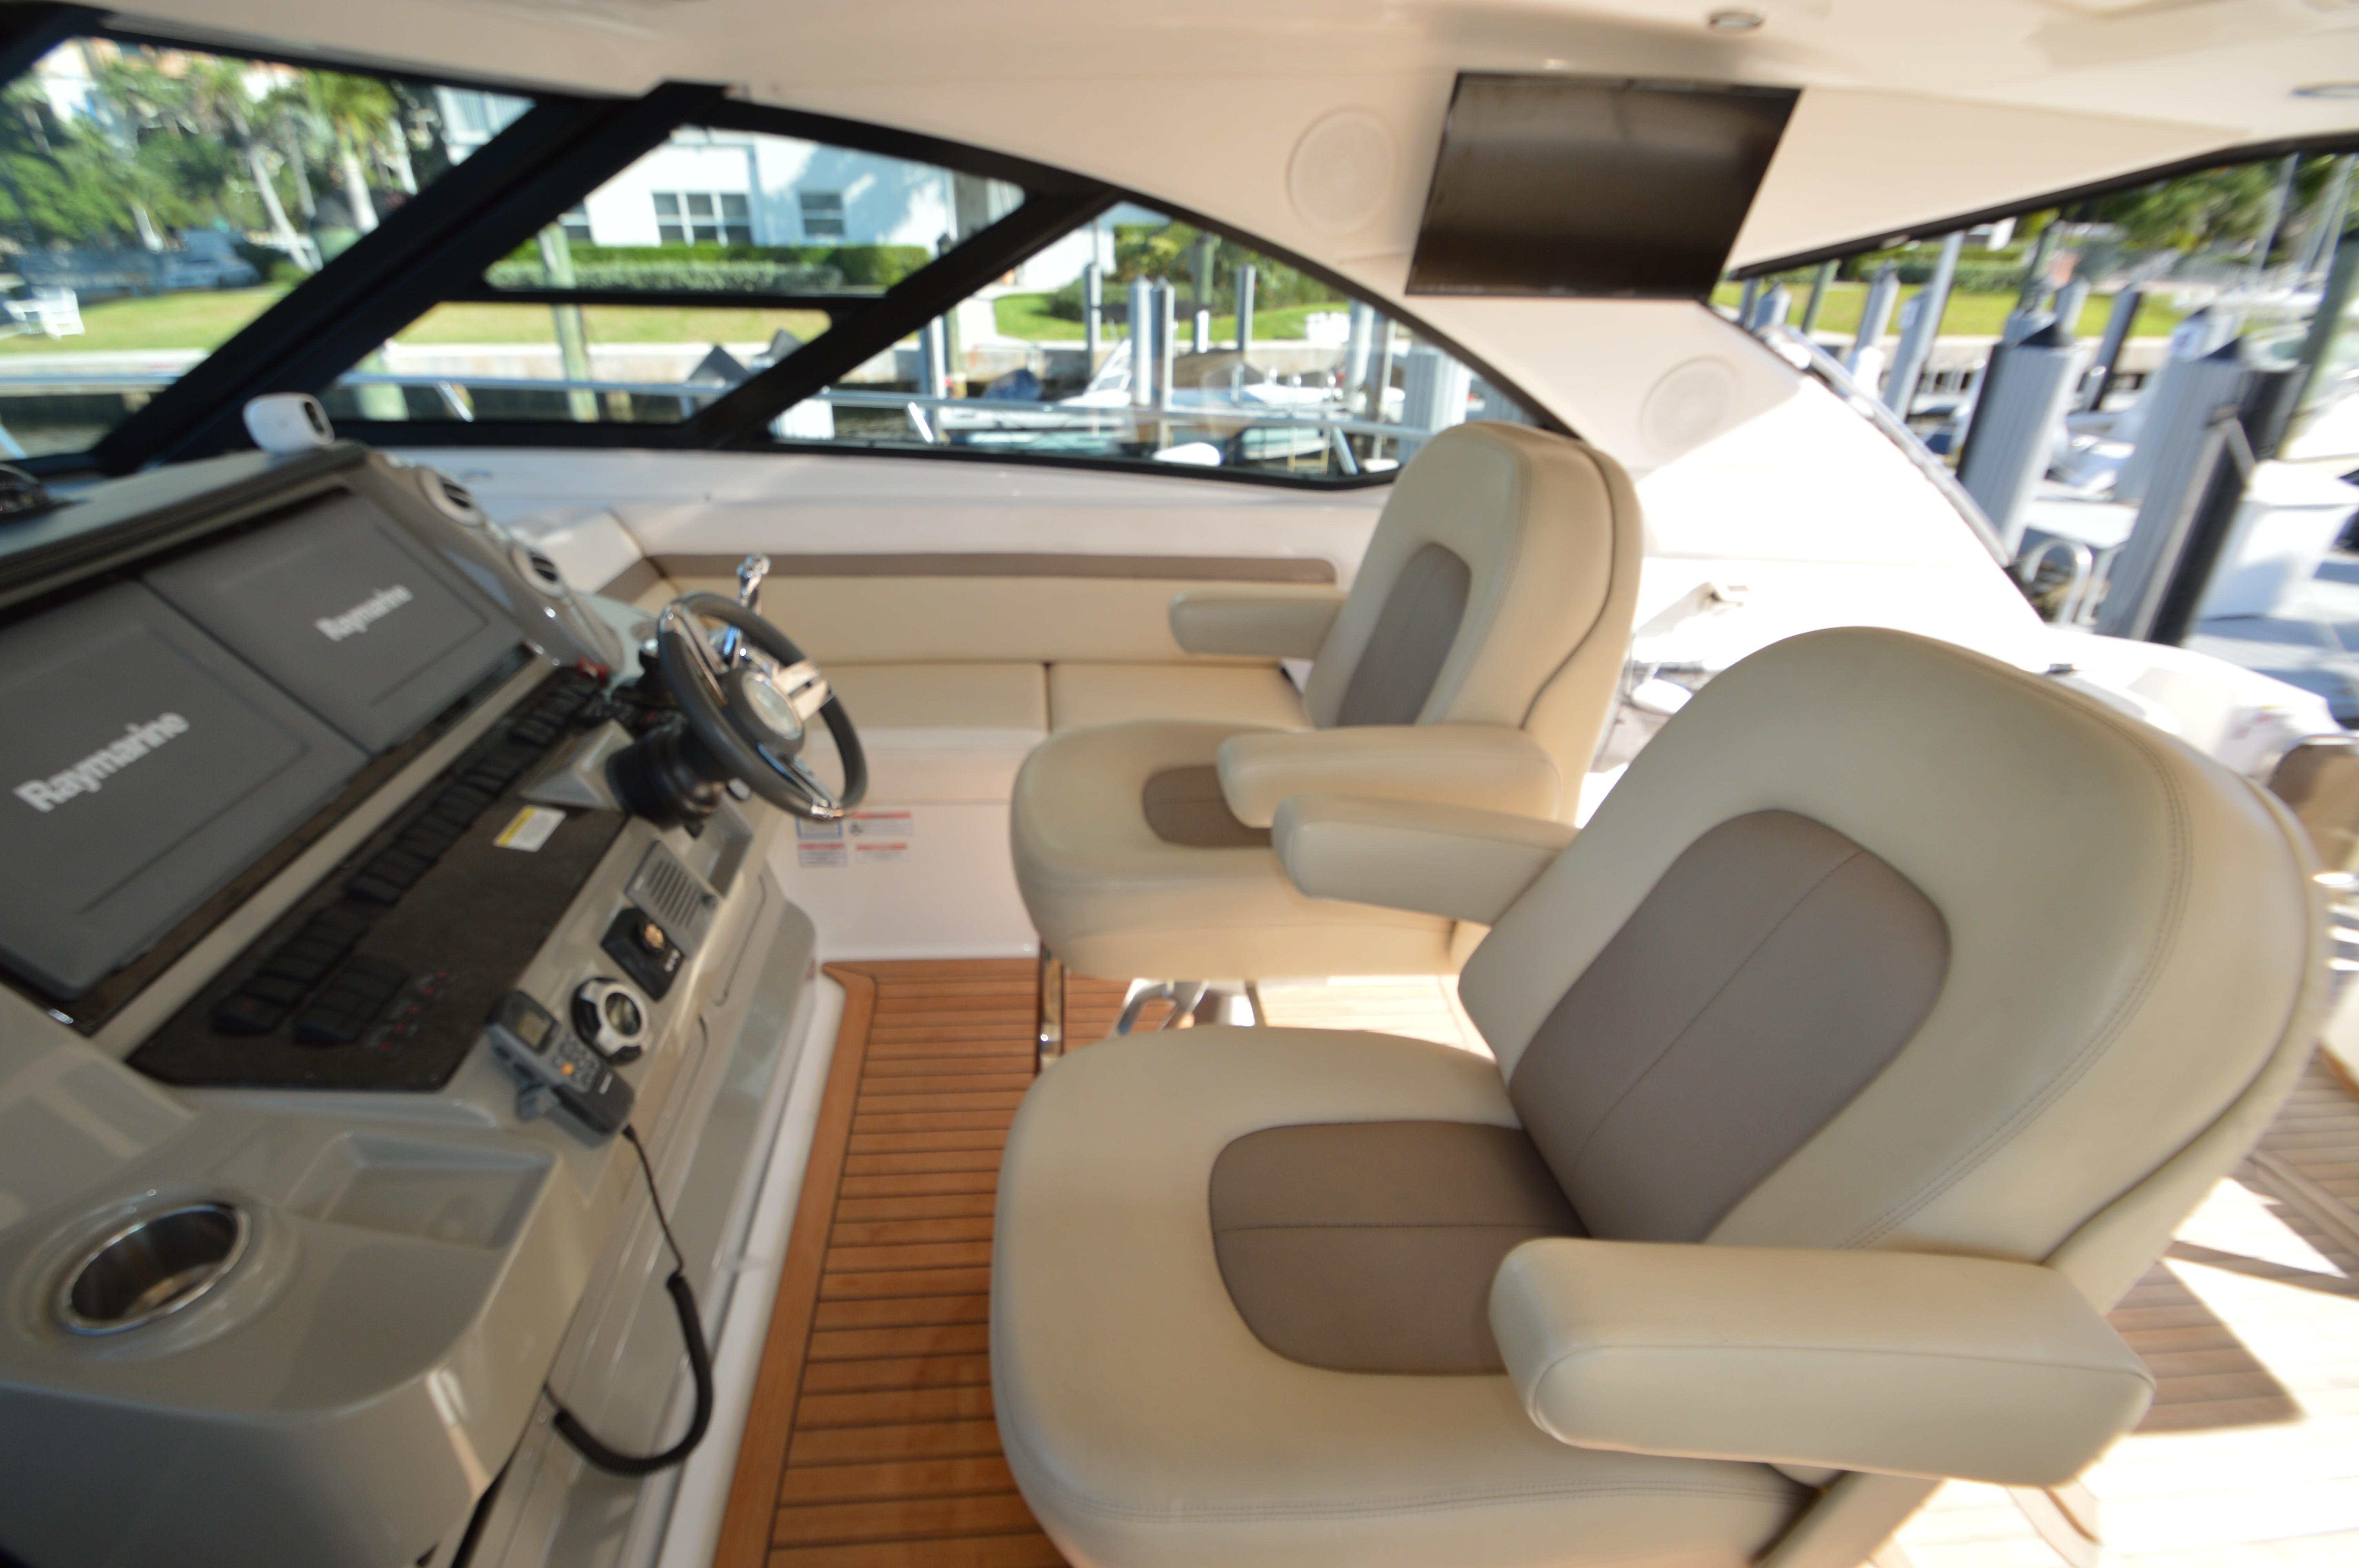 2012 Sea Ray 540 Lazy Blum - Helm Seats